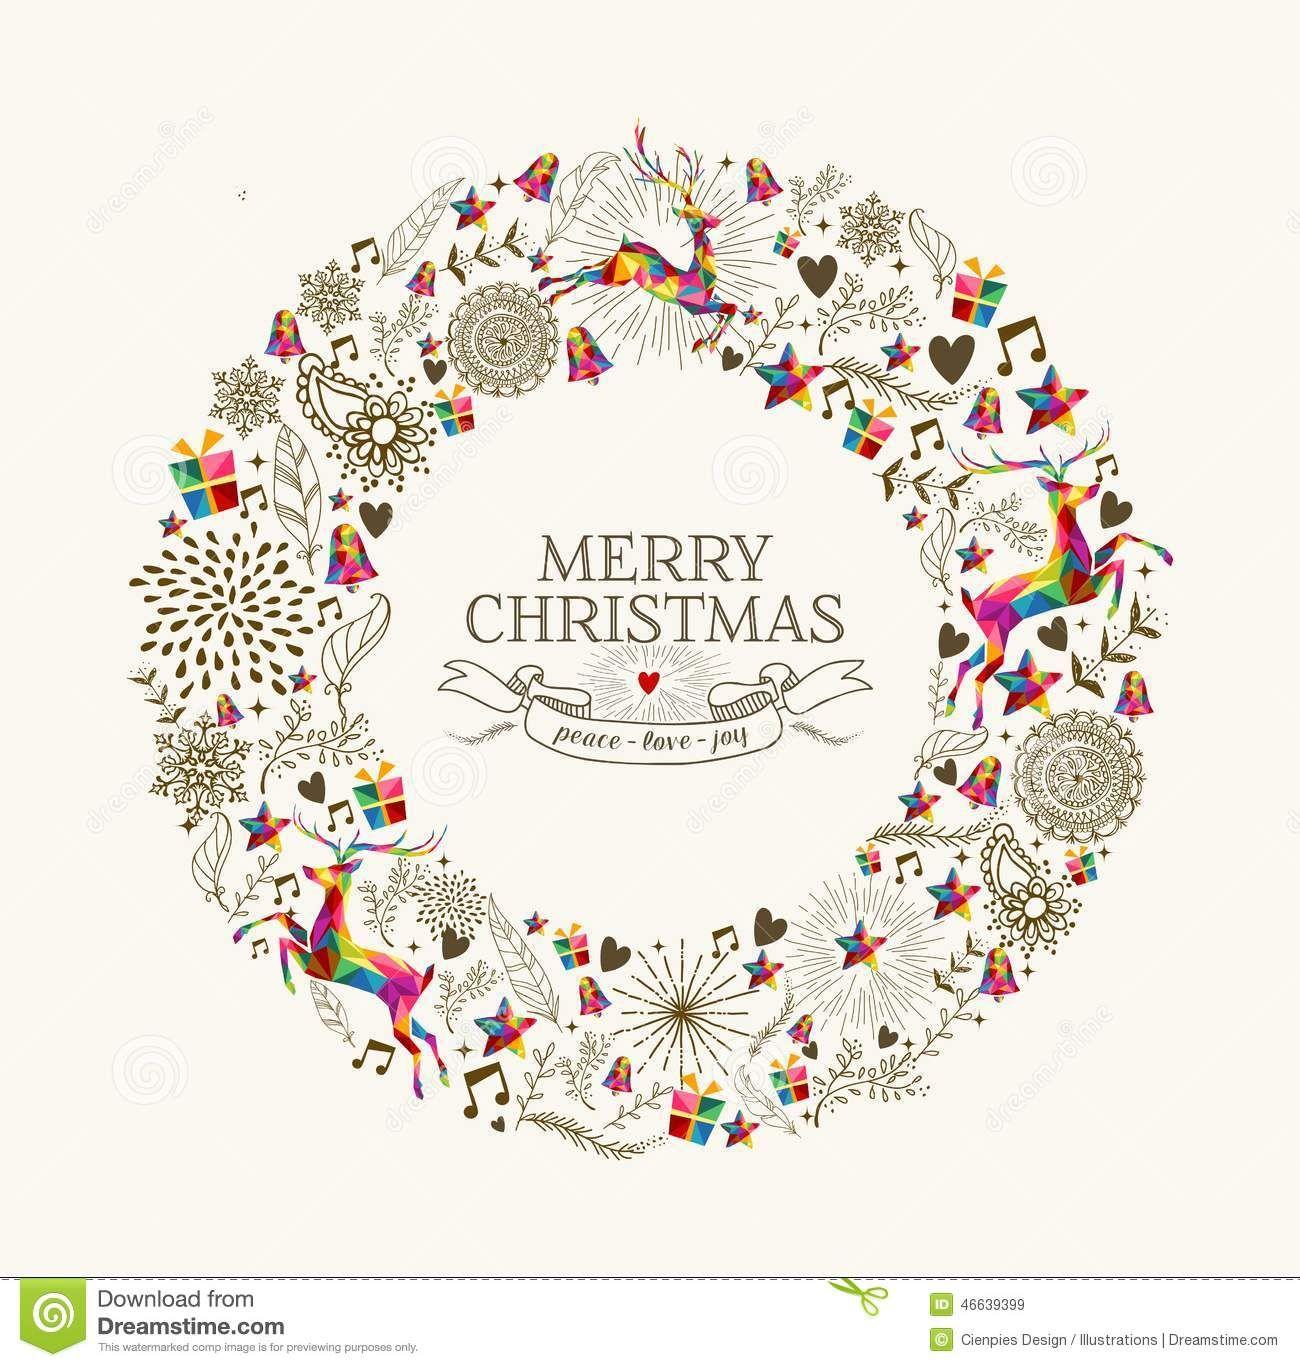 Vintage Christmas Wreath Greeting Card Stock Vector - Image: 46639399